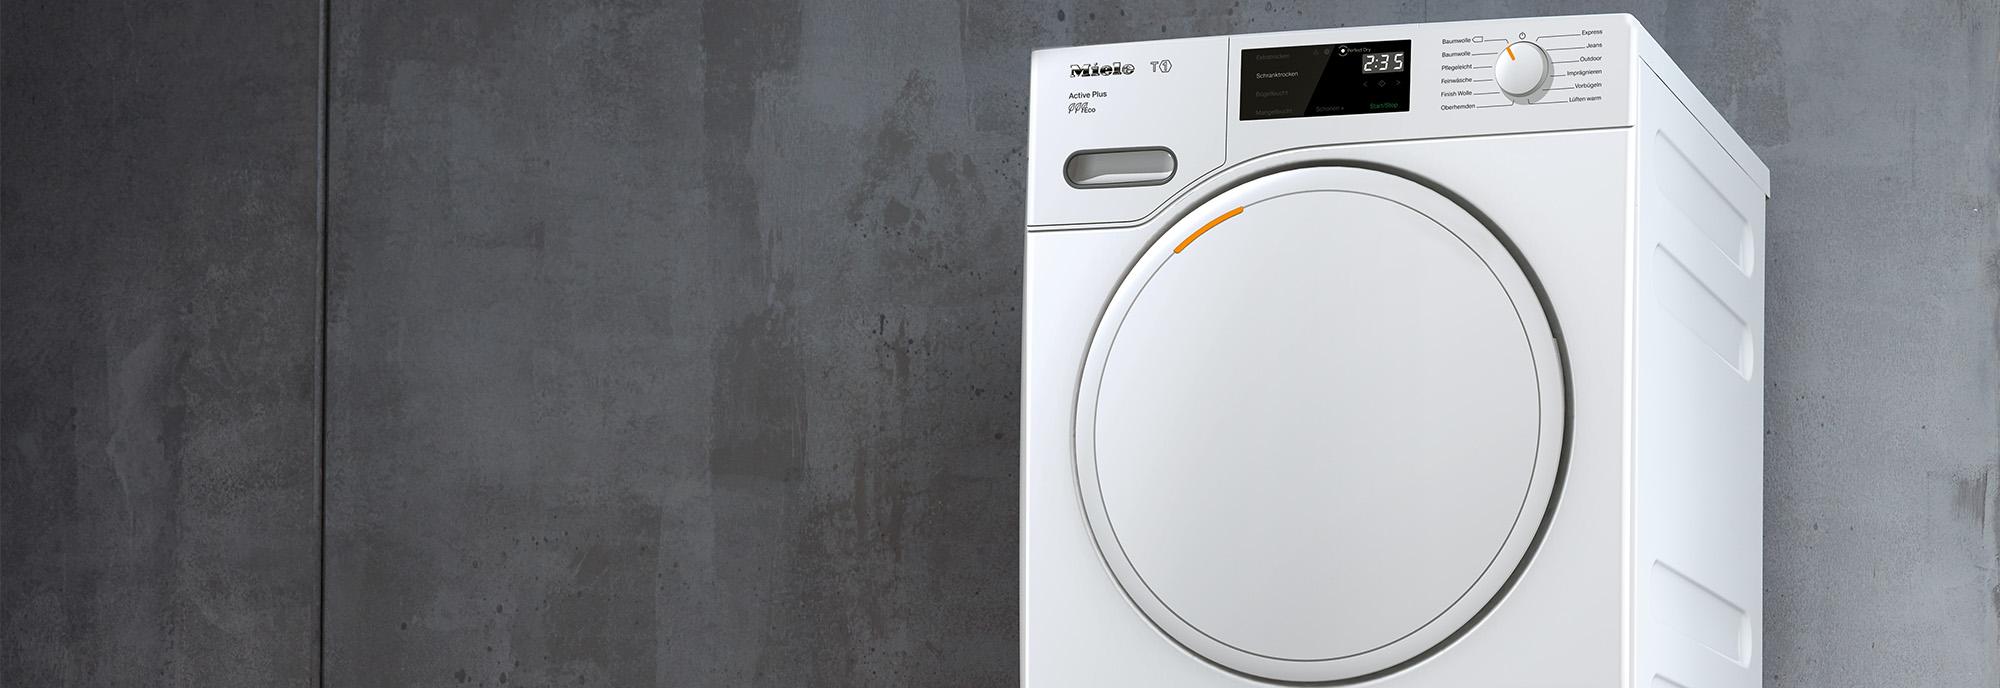 Miele T1 Active Plus TWE520WP 8Kg Heat Pump Tumble Dryer - White - A+++  Rated